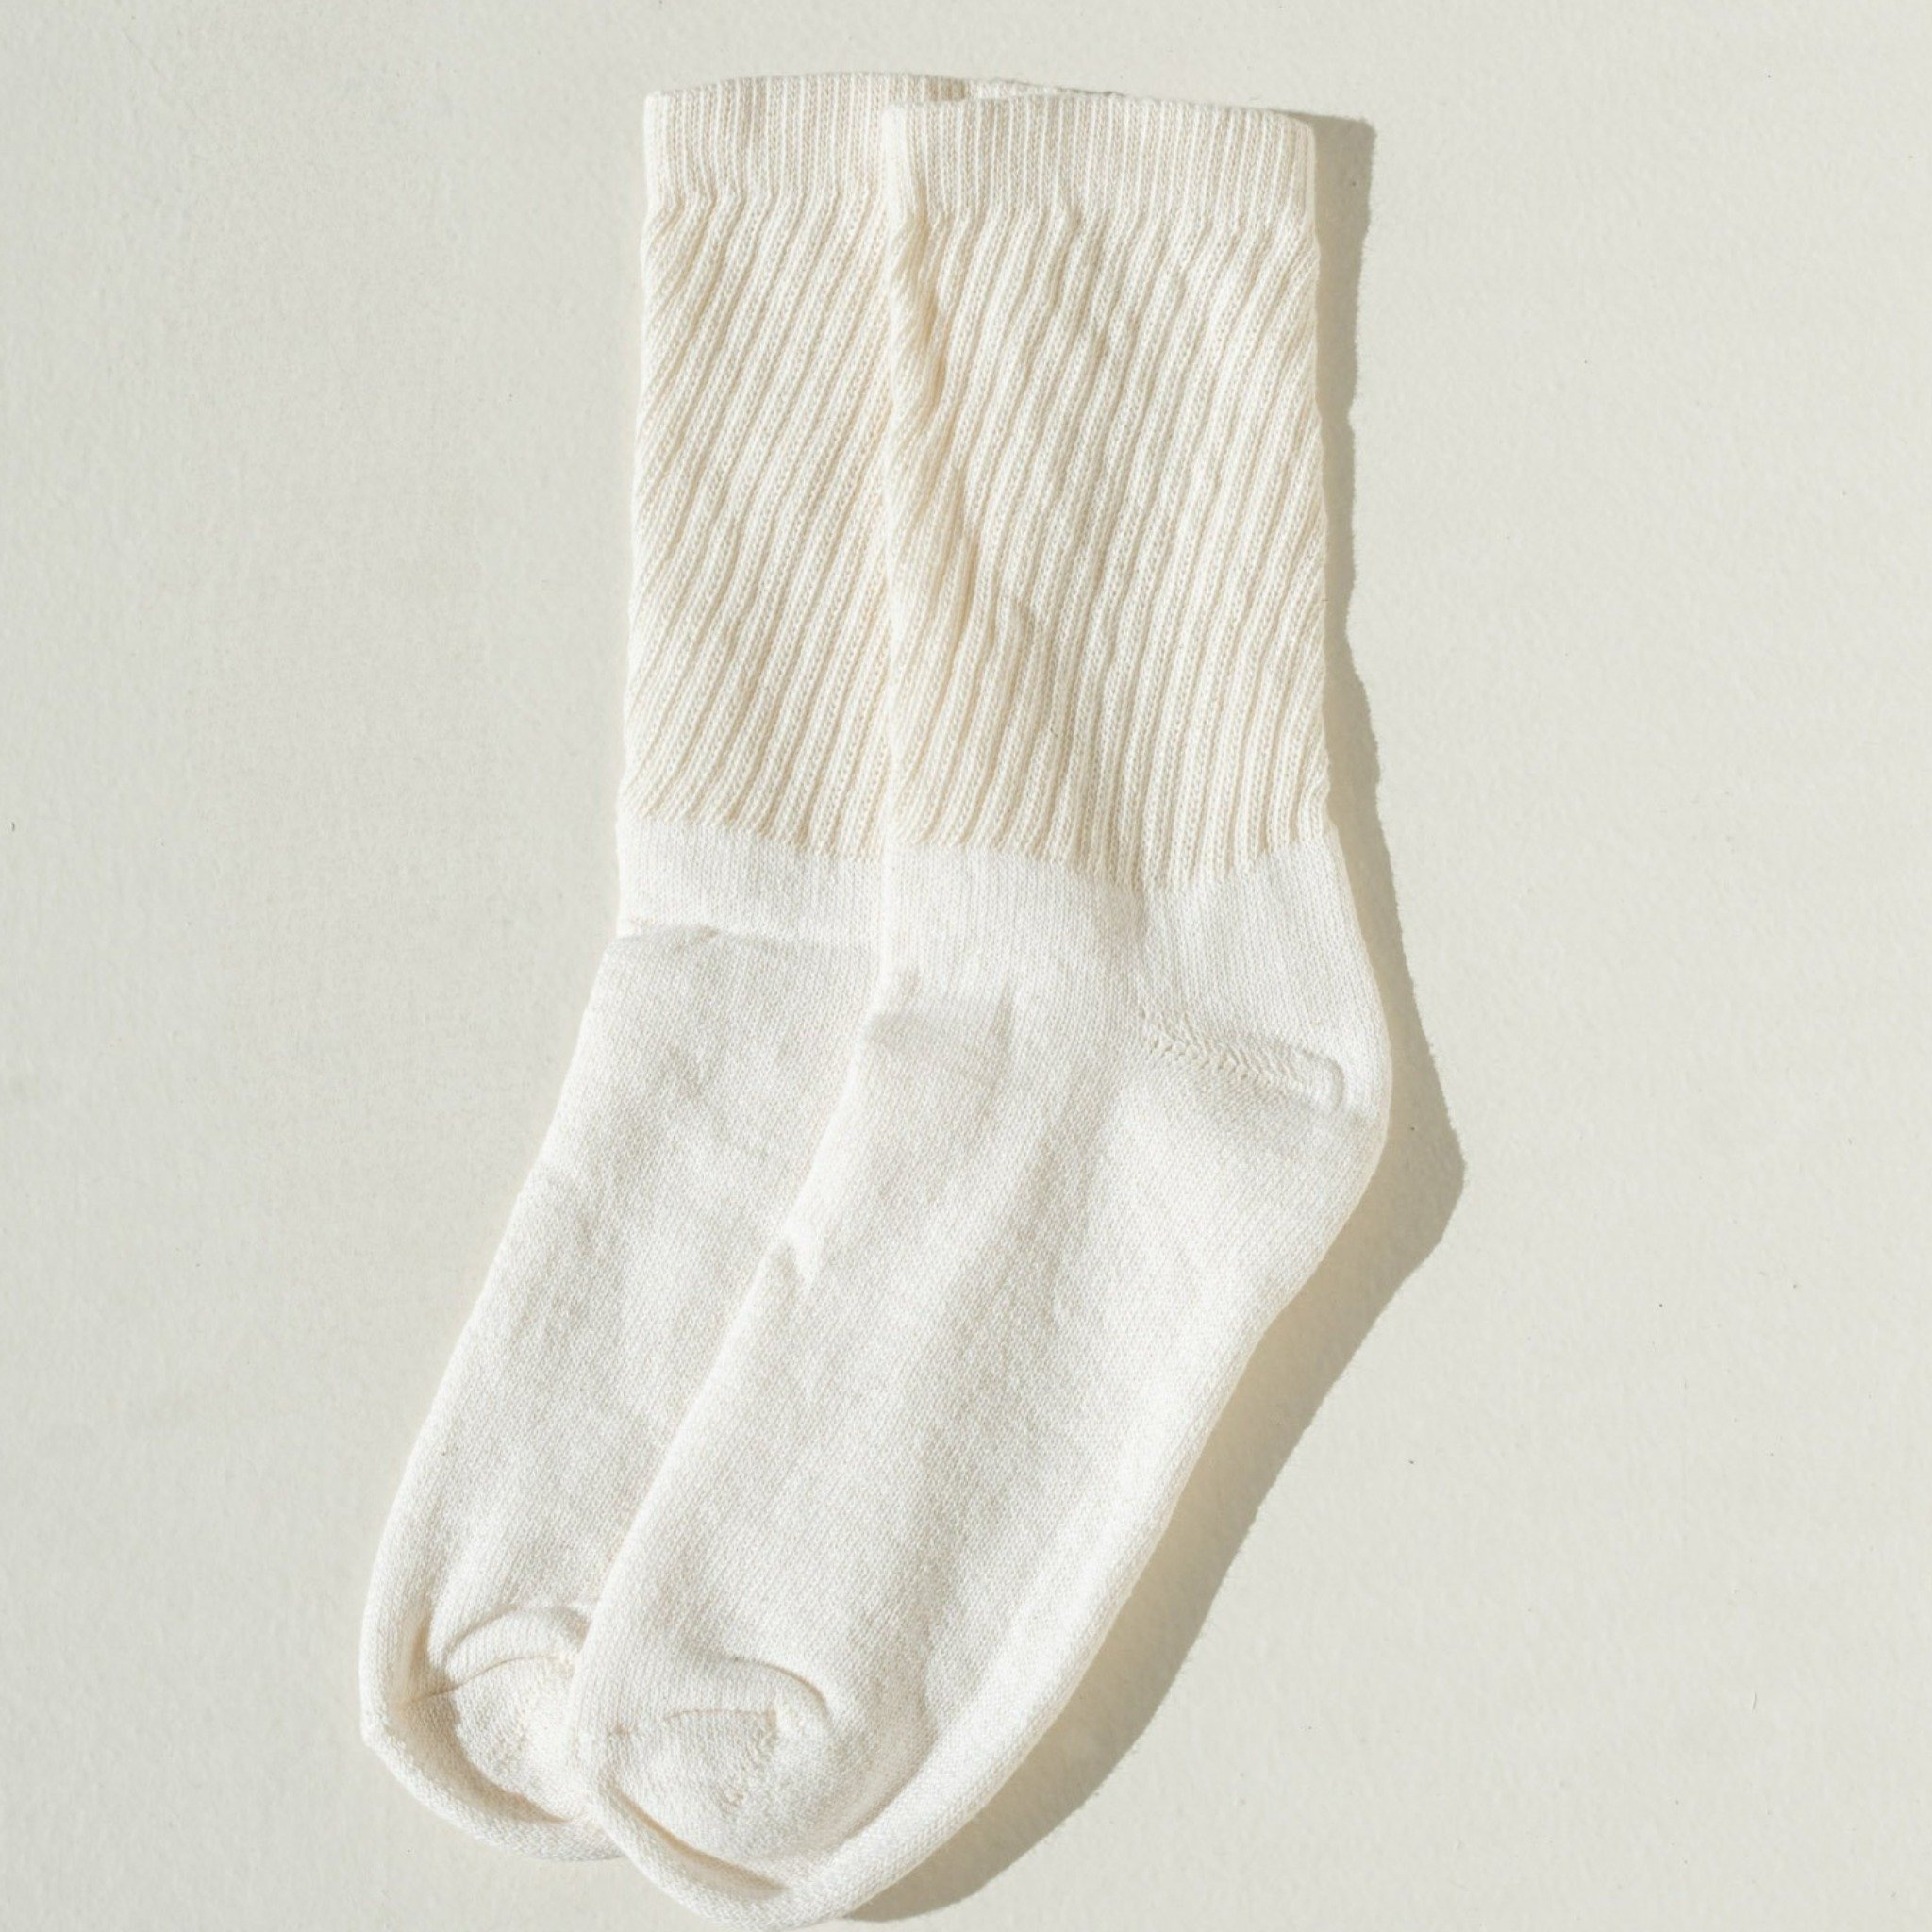 Organic Cotton Cozy Sock 3 Pack